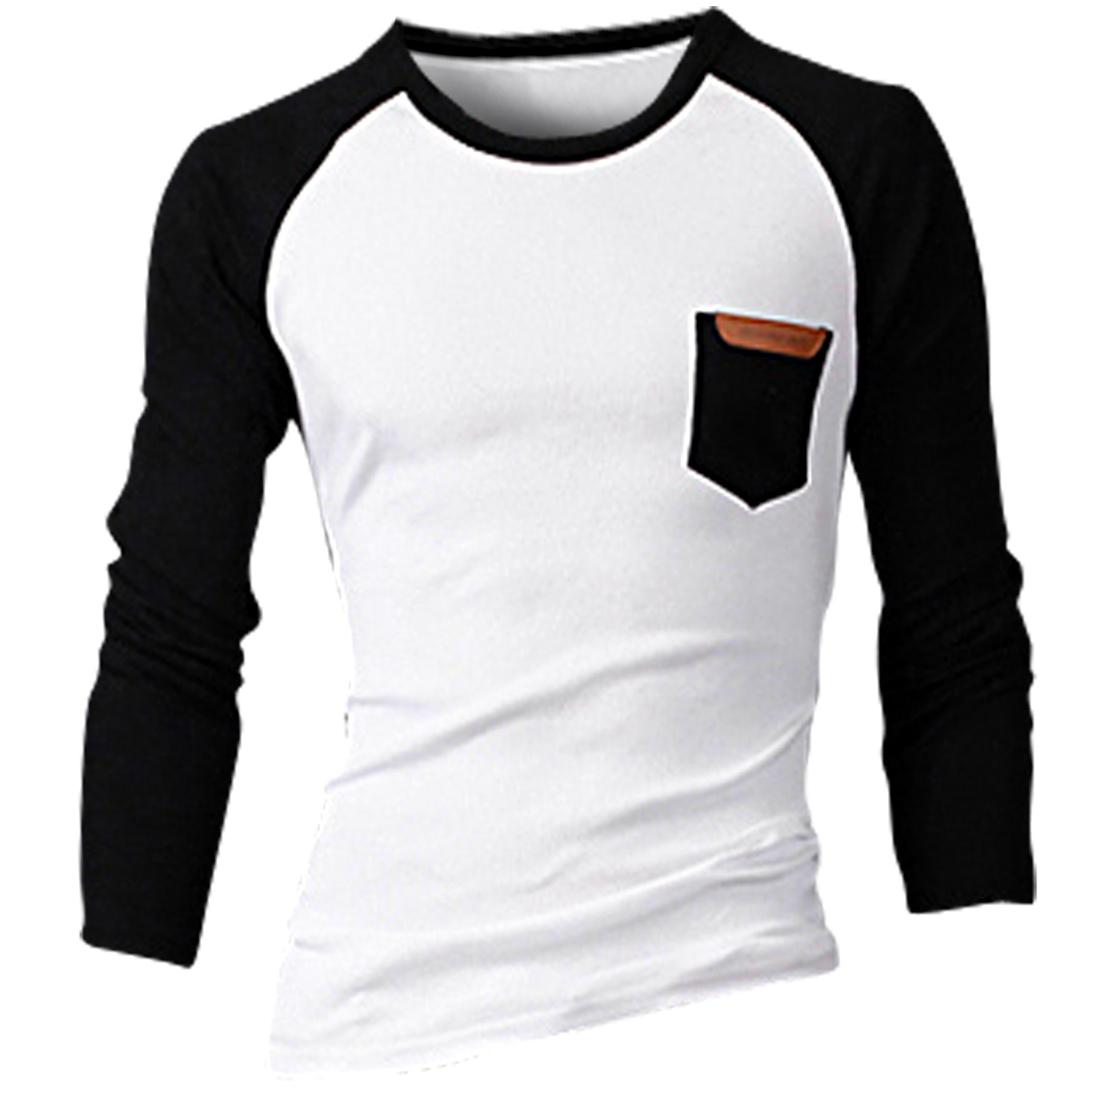 Men Raglan Sleeve Contrast Color T-shirt Black White M